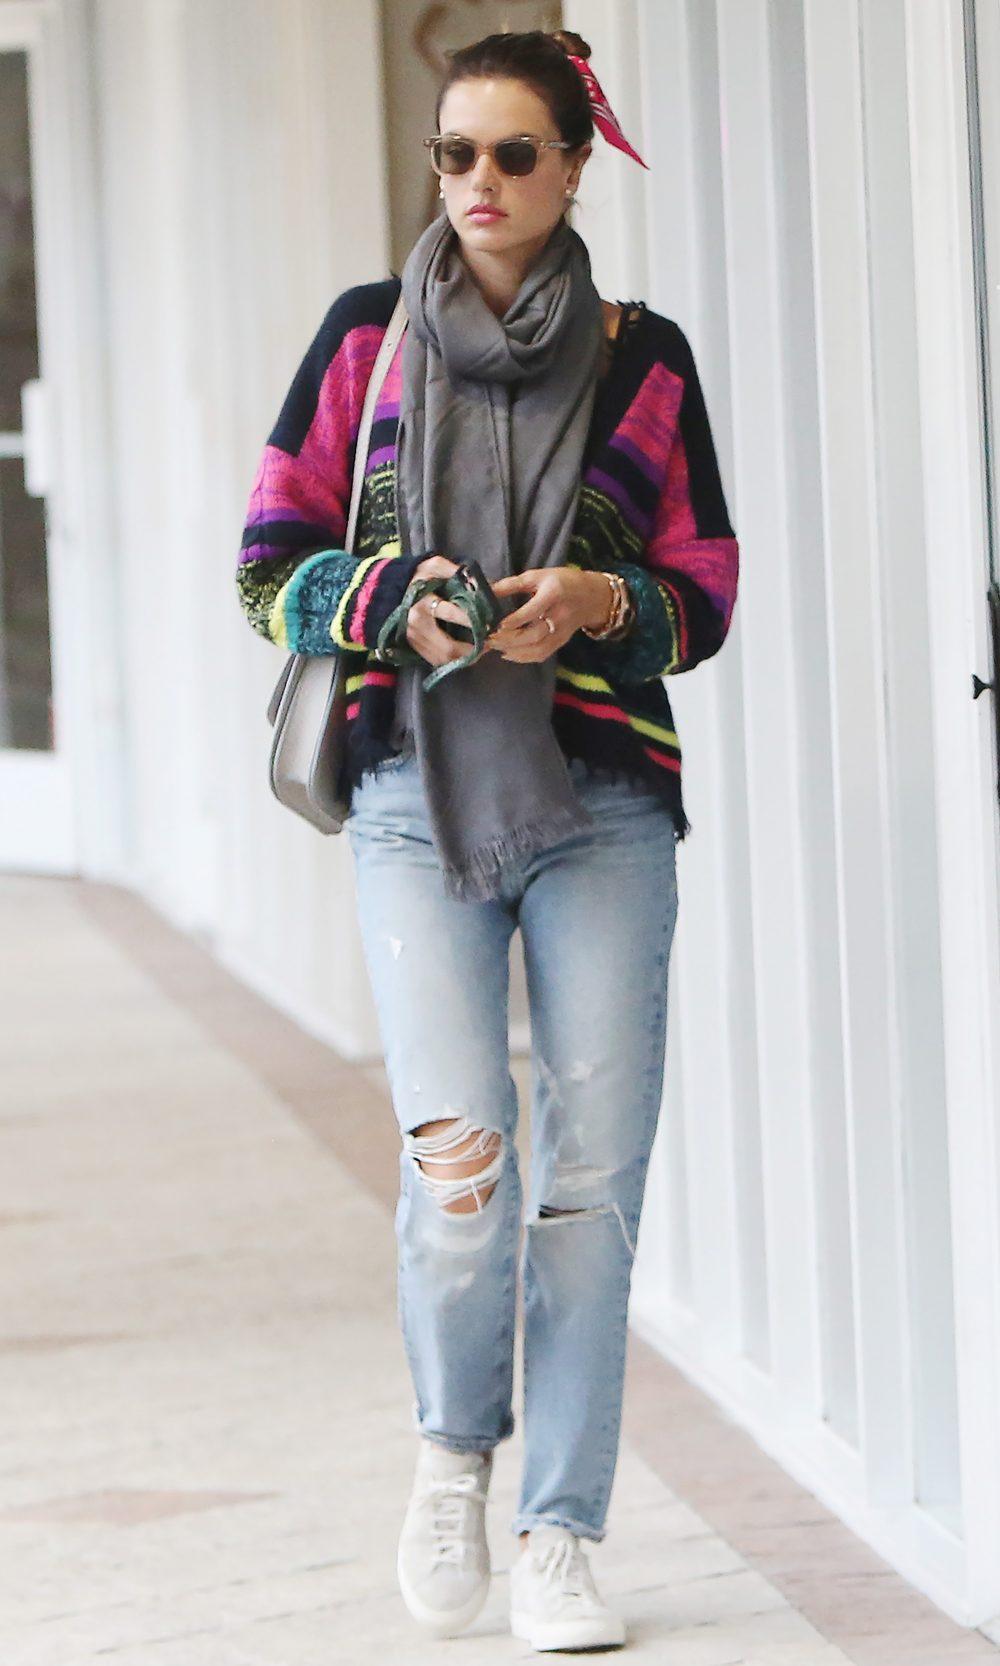 Top Model Alessandra Ambrosio braves the rain to run her errands in Santa Monica